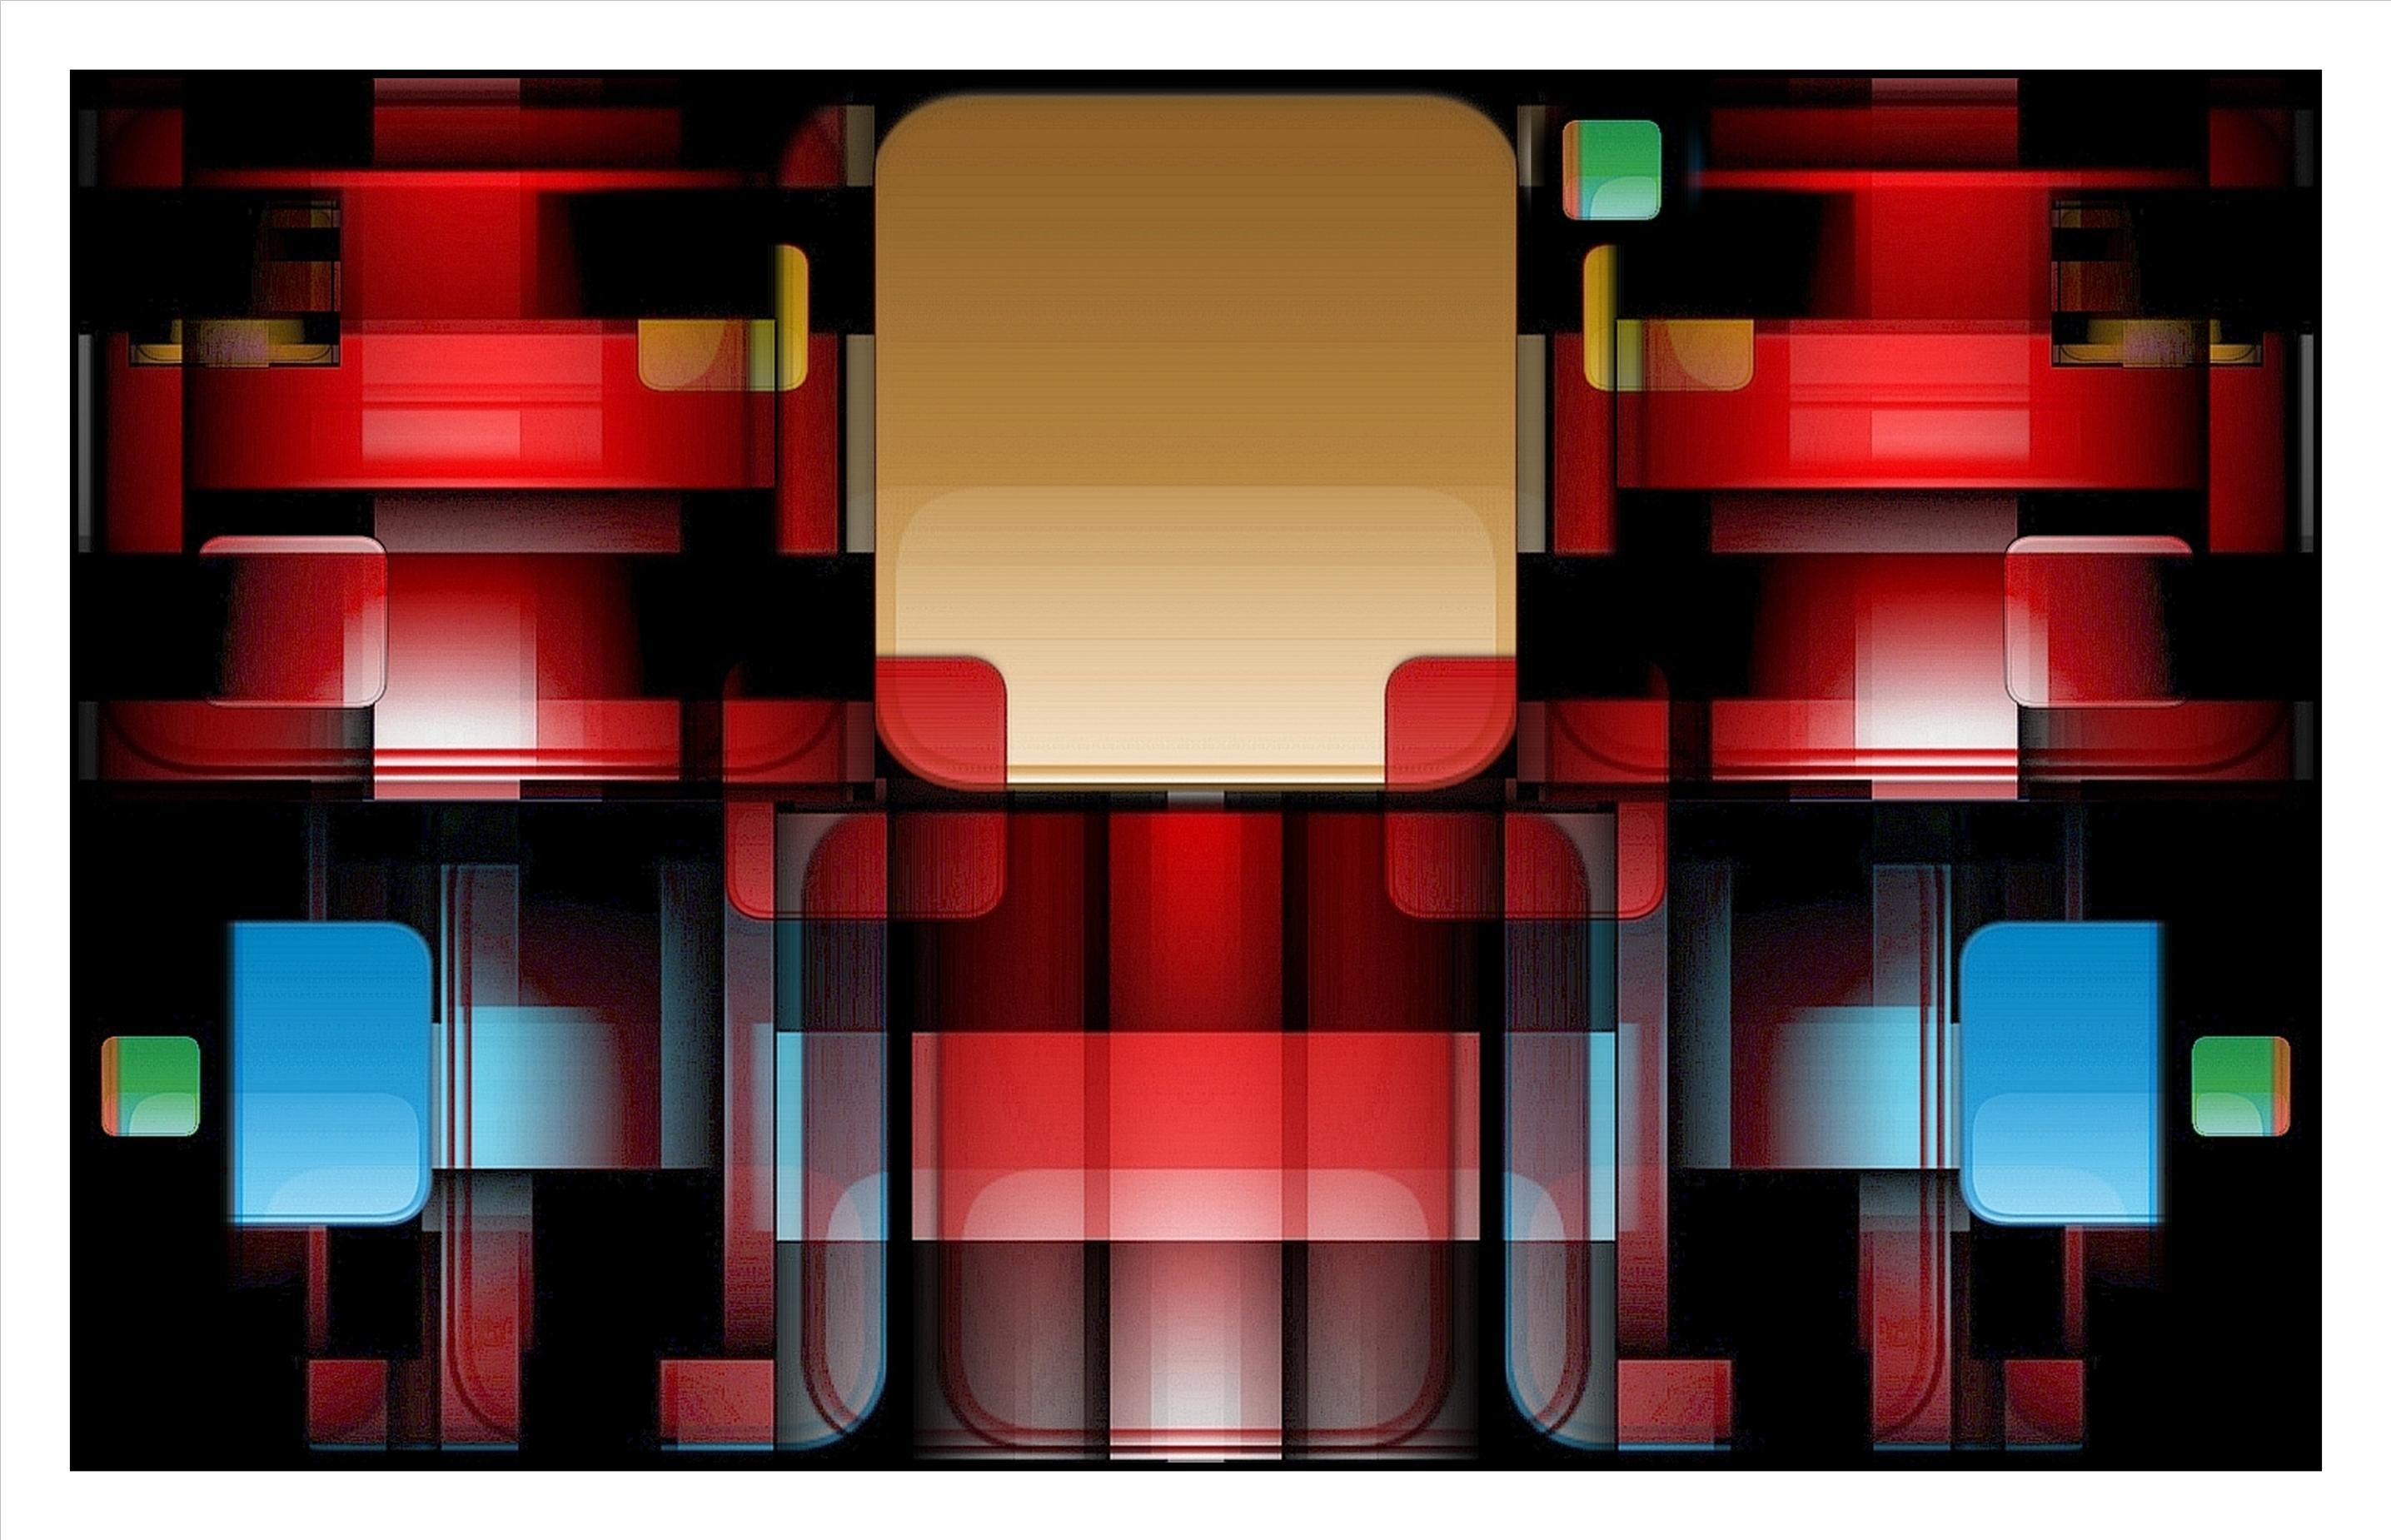 Tapete Bücherregal hintergrundbilder rot produkt regale entwurf regal product